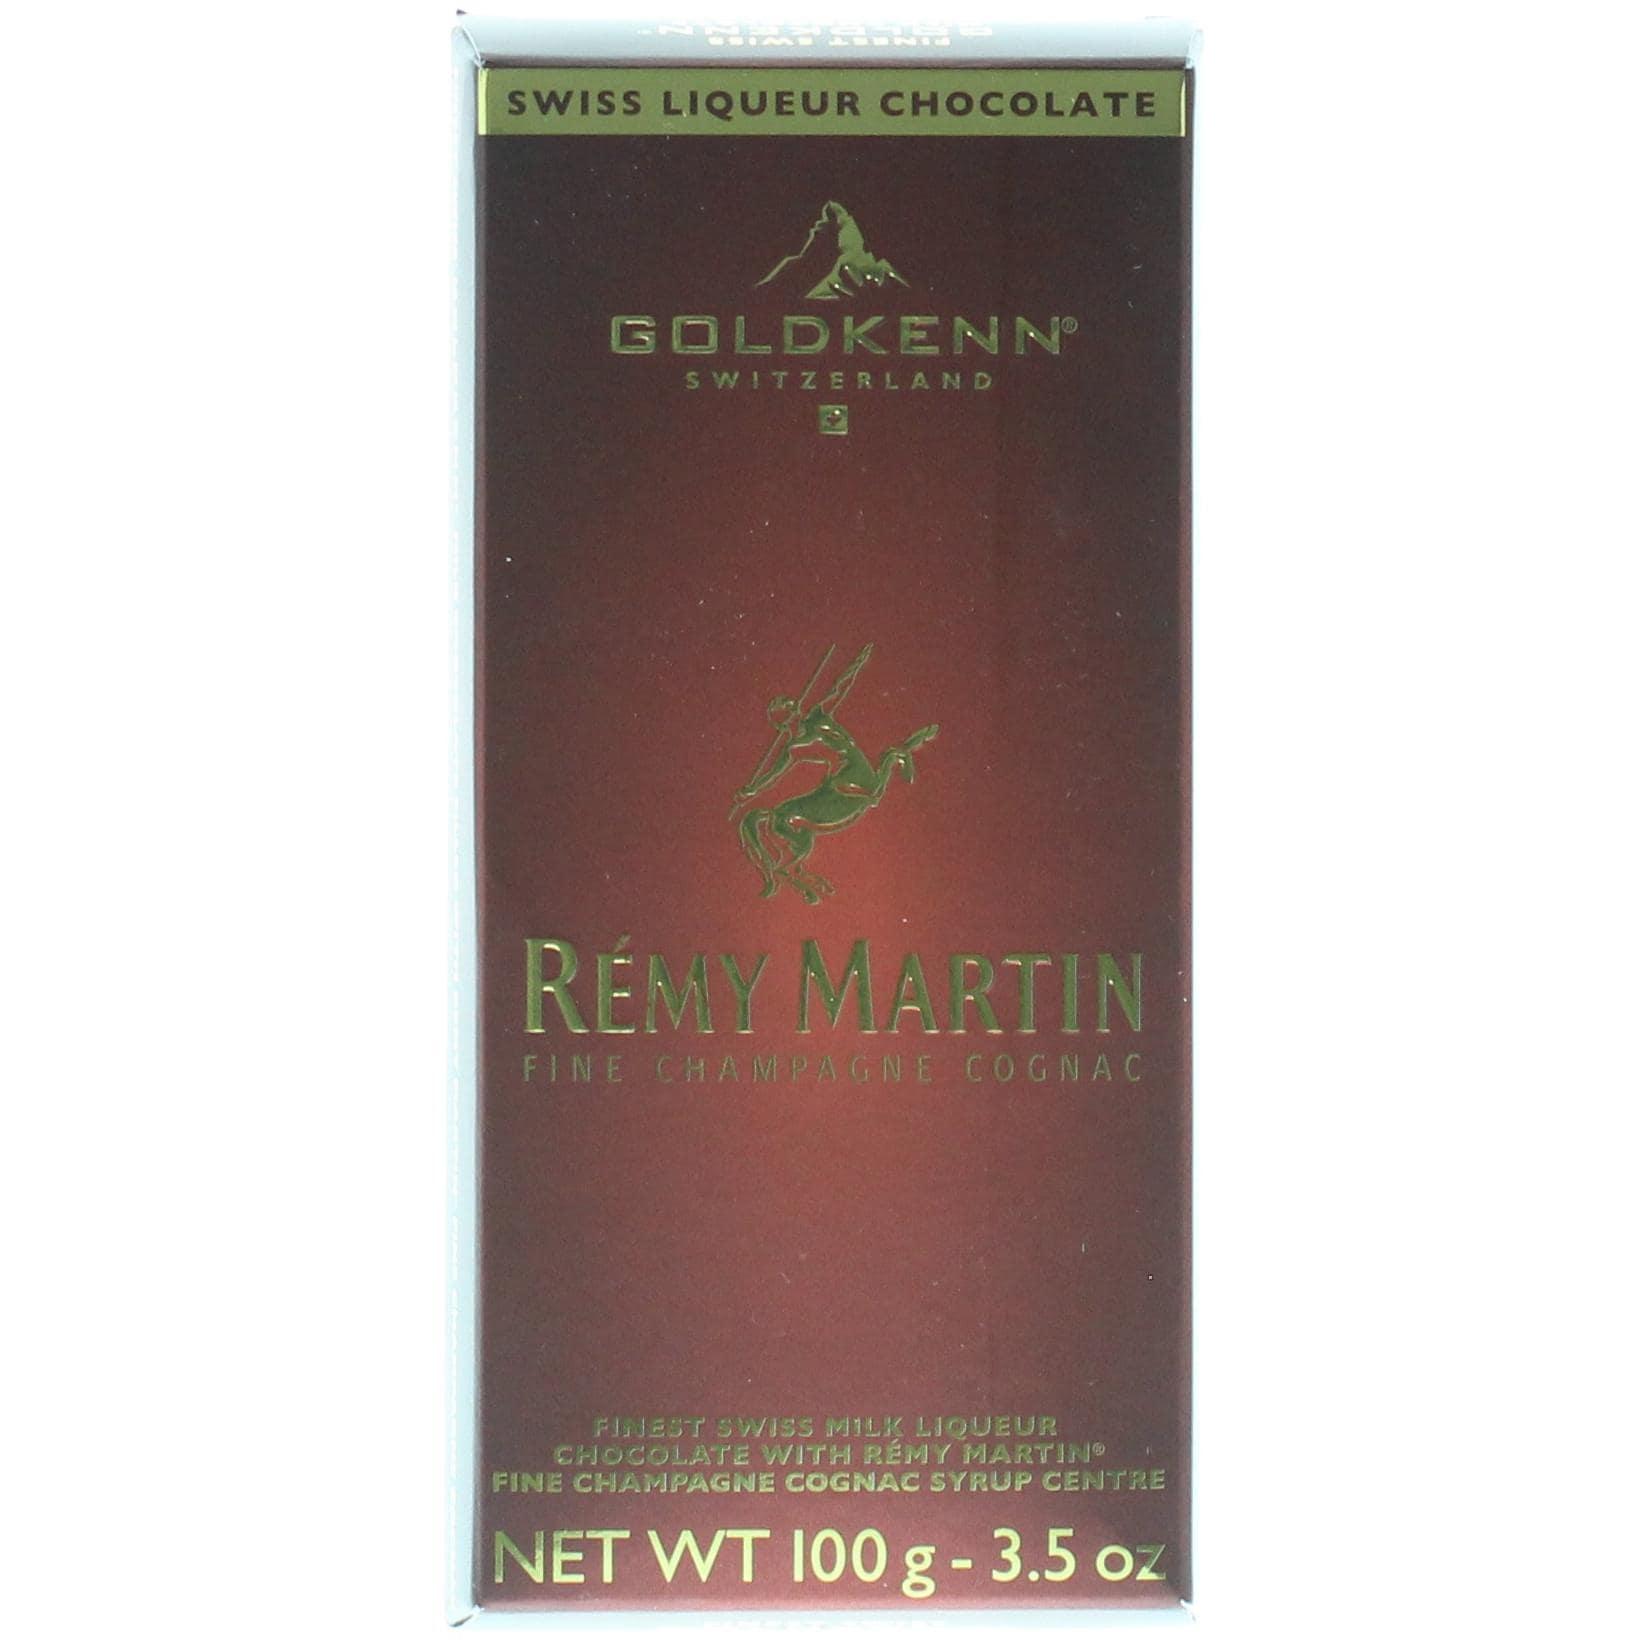 Goldkenn - Rémy Martin Fine Champagne Cognac Schokolade Confiserie - 100g